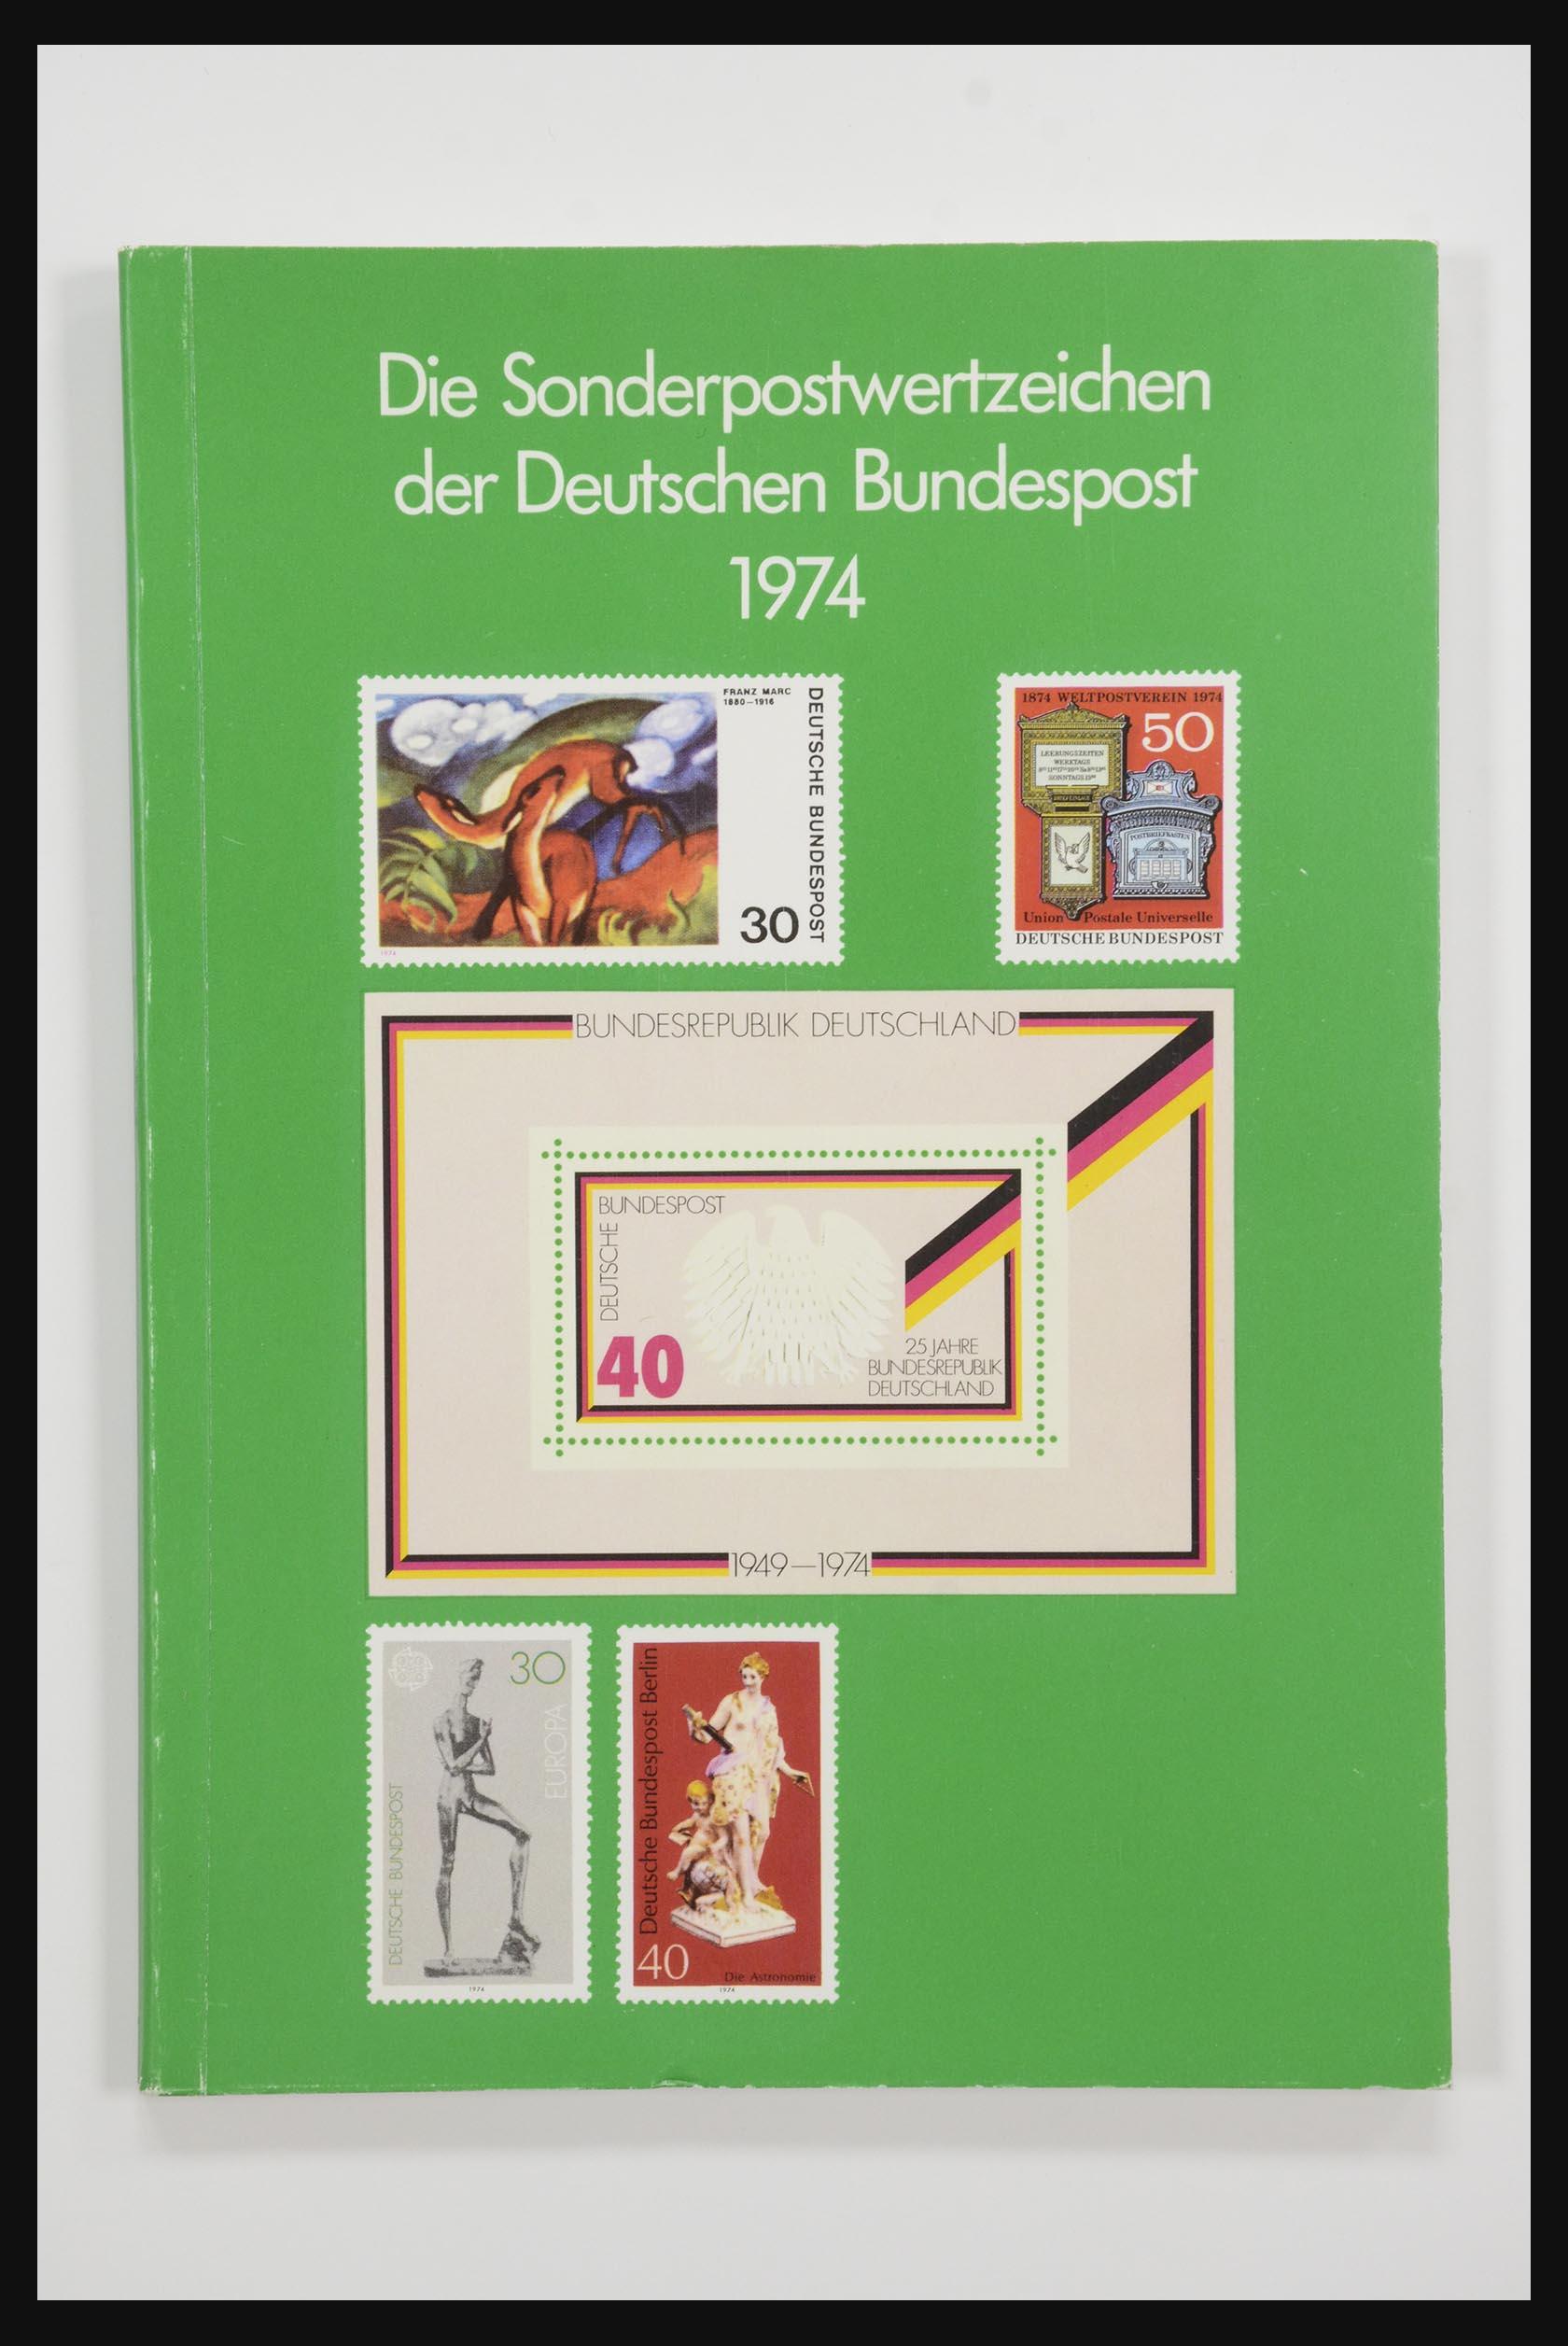 31834 002 - 31834 Bundespost yearbooks 1973(!)-1999.